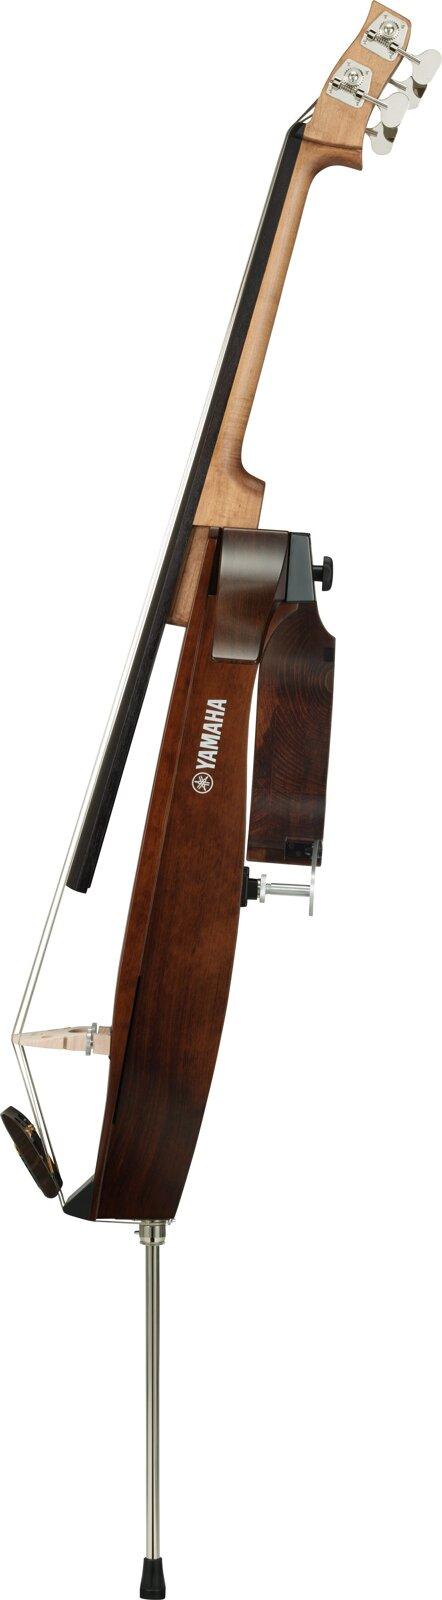 Yamaha Strings Contrebasse SLB-300 Silent Bass : photo 2